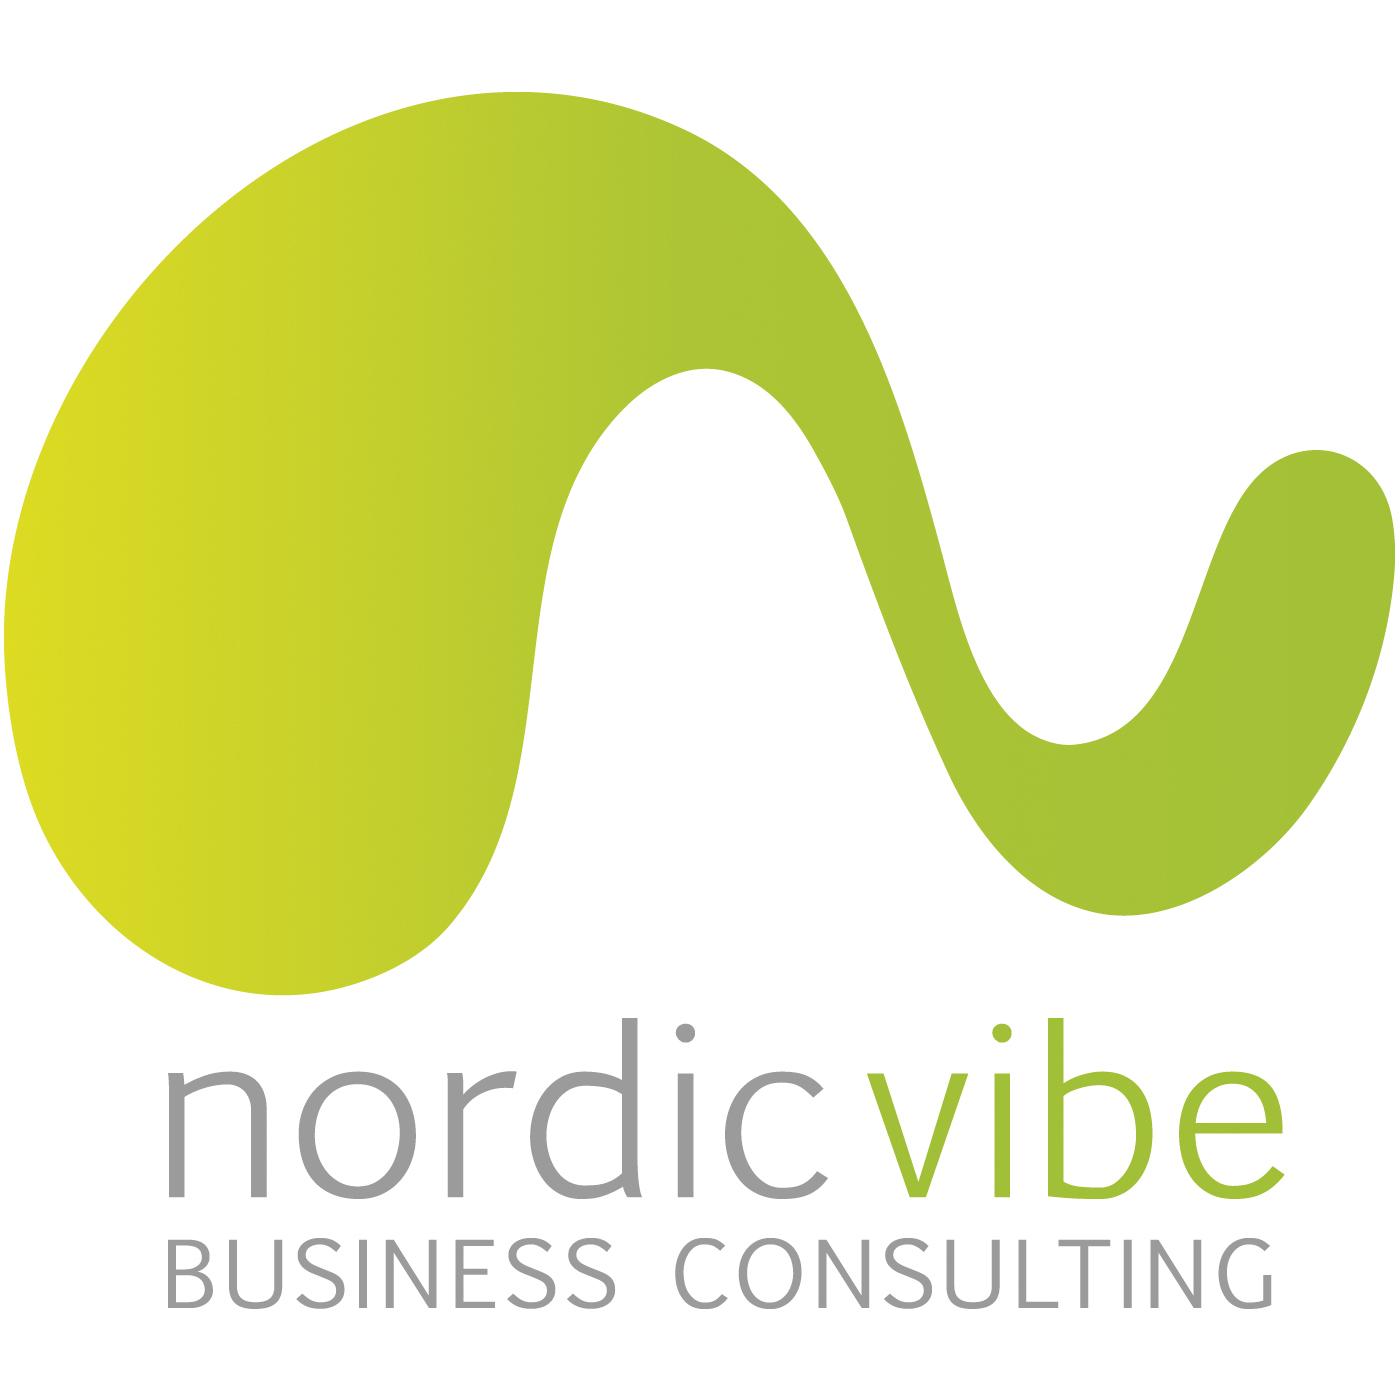 nordicvibe AB